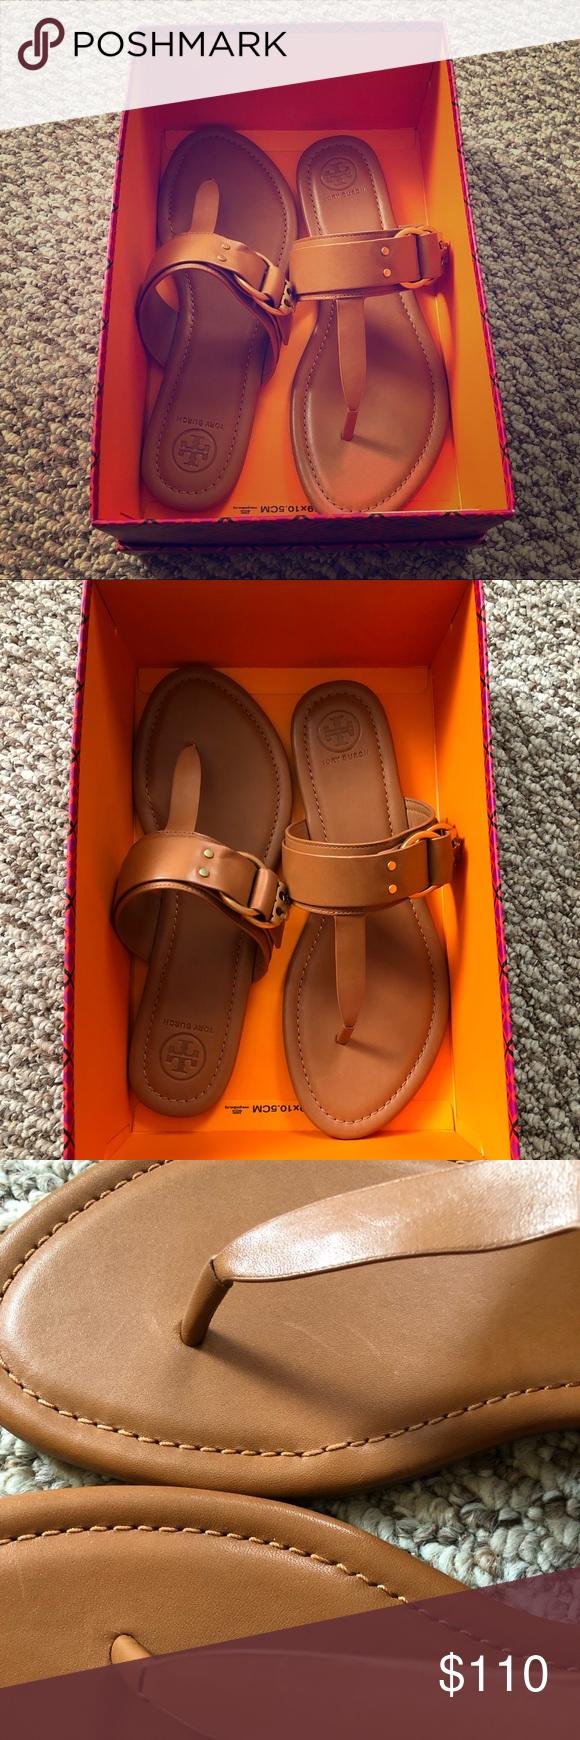 9e03603ce44 NIB Tory Burch Marsden flat leather sandal sz 9.5 Tory Burch